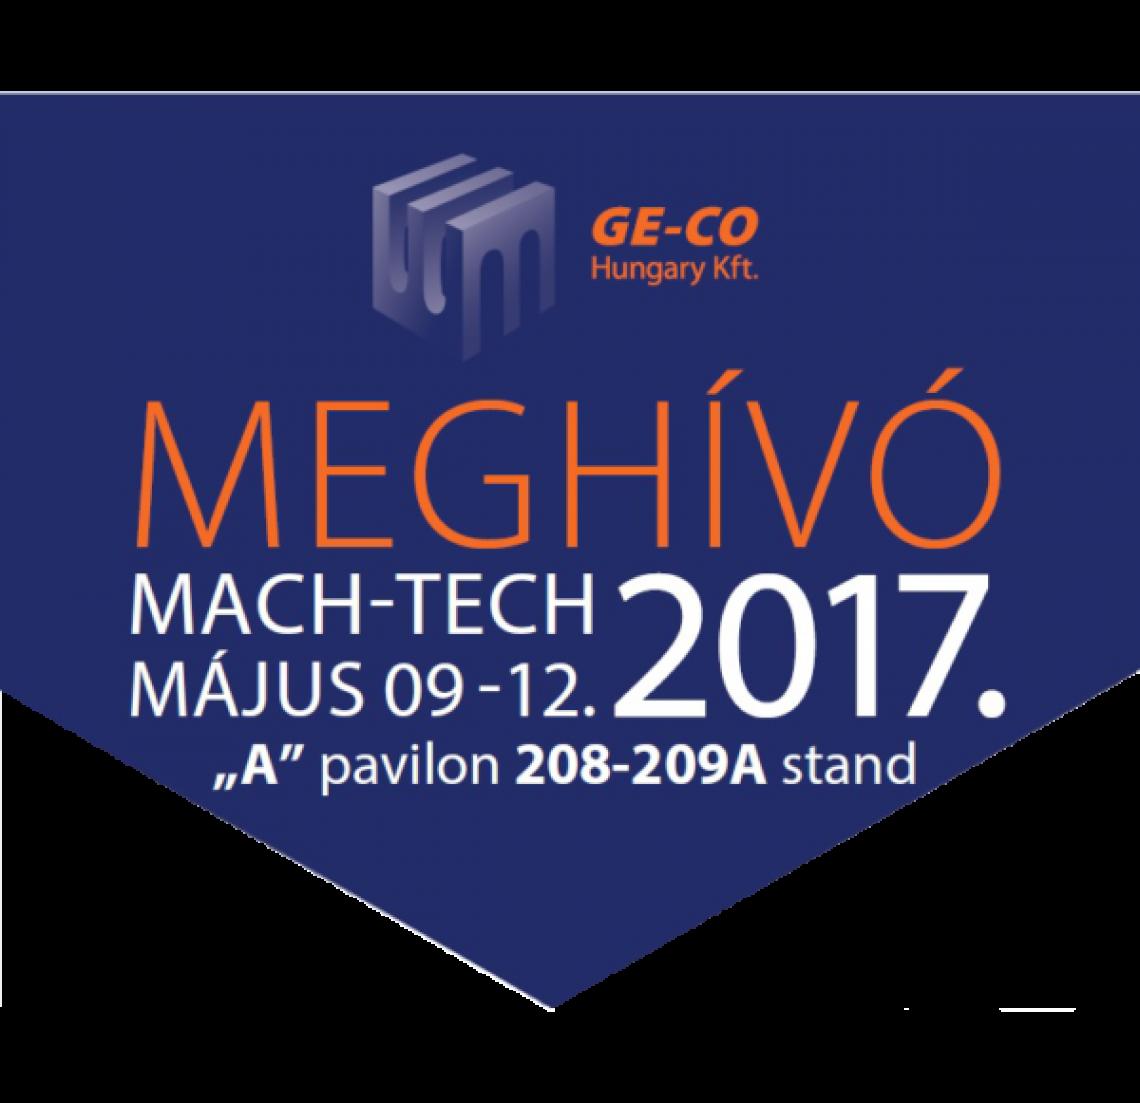 mach_tech_2017_hungexpo_kiallitas_ingyenes_regisztracio_rendezveny_meghivo-e1492025819382